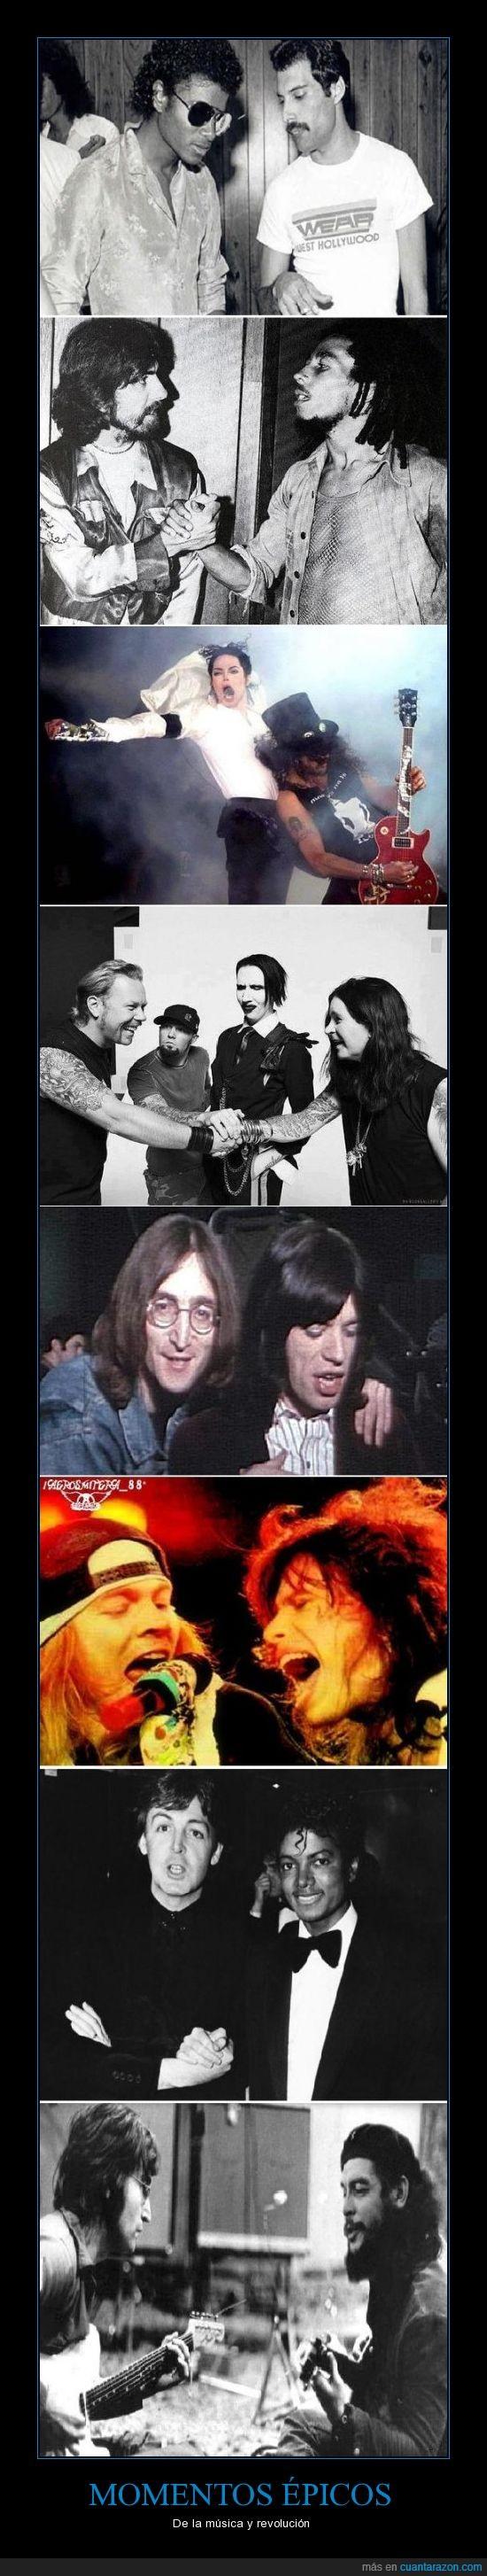 Axl Rose,Bob Marley,Che Guevara,Fred Durst,Freddie Mercury,George Harrison,James Hetfield,John Lennon,Marilyn Manson,Michael Jackson,Mick Jagger,Momentos épicos.,Ozzy Osbourne,Paul McCartney,Slash,Steve Taylor